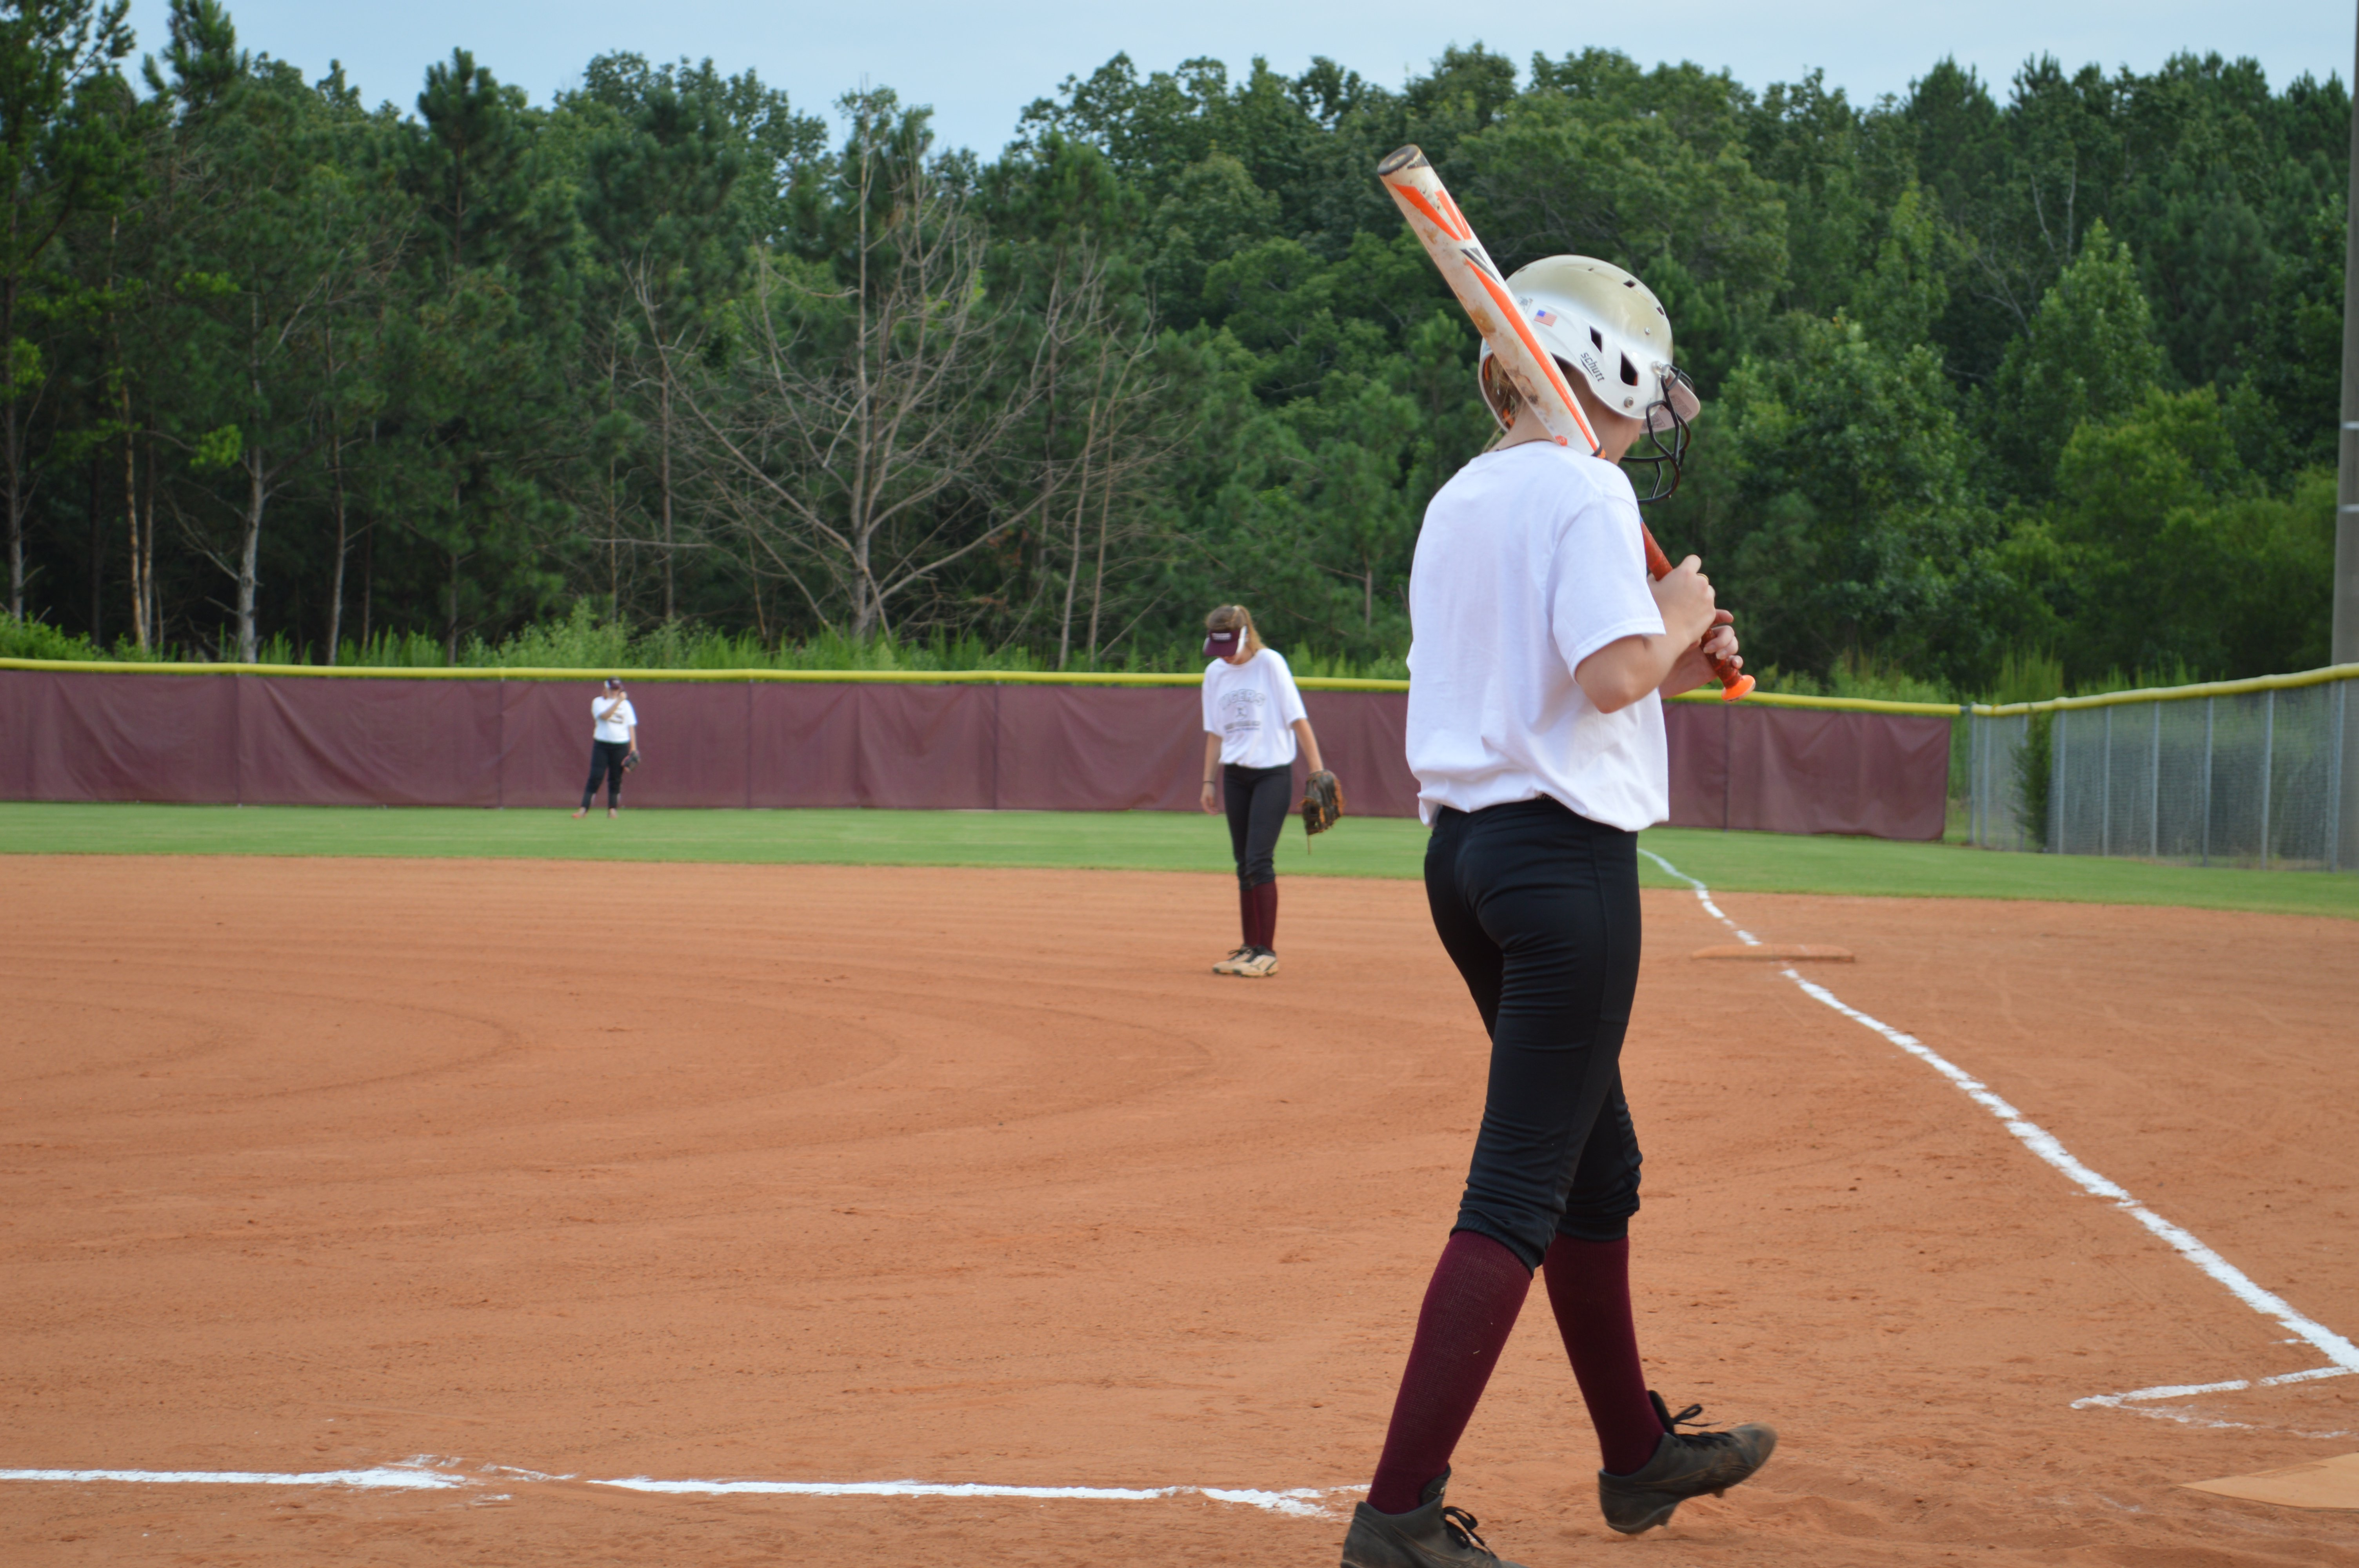 Softball gets underway